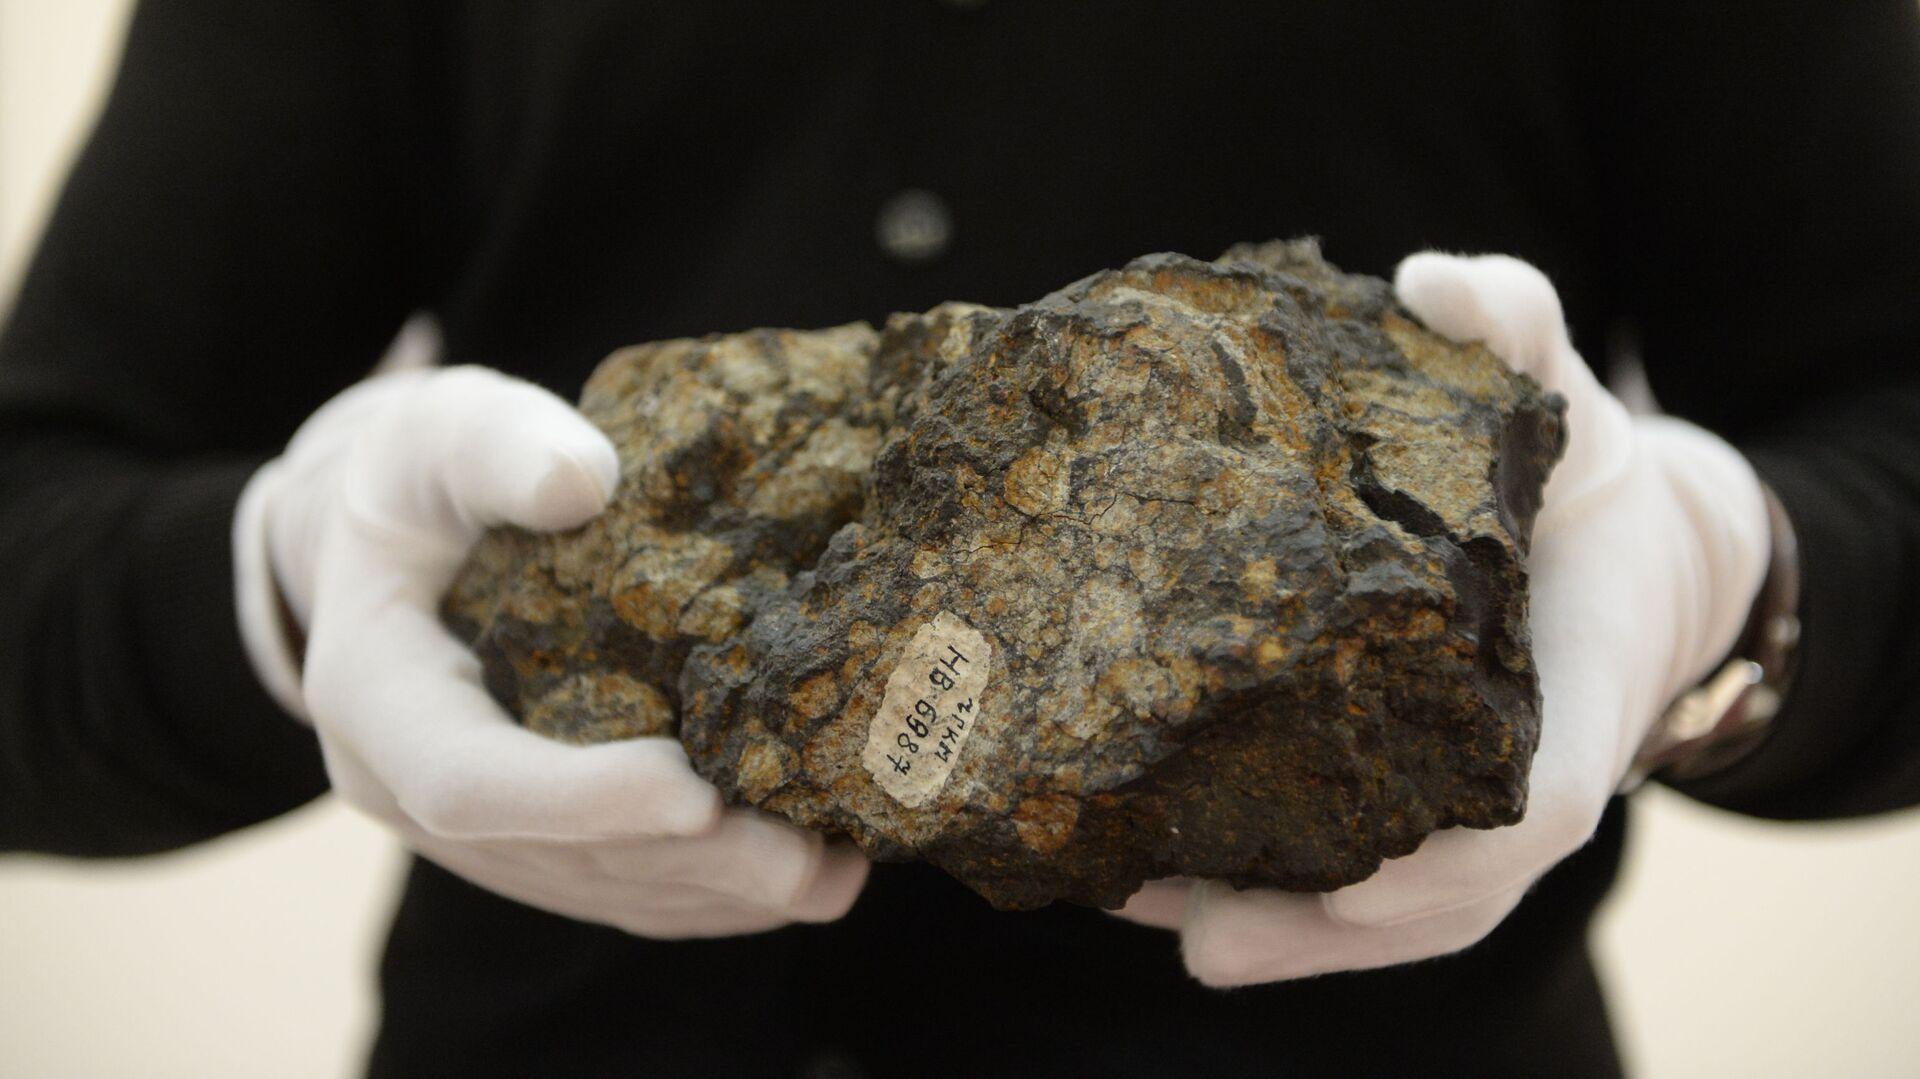 Una pieza del meteorito - Sputnik Mundo, 1920, 17.04.2021